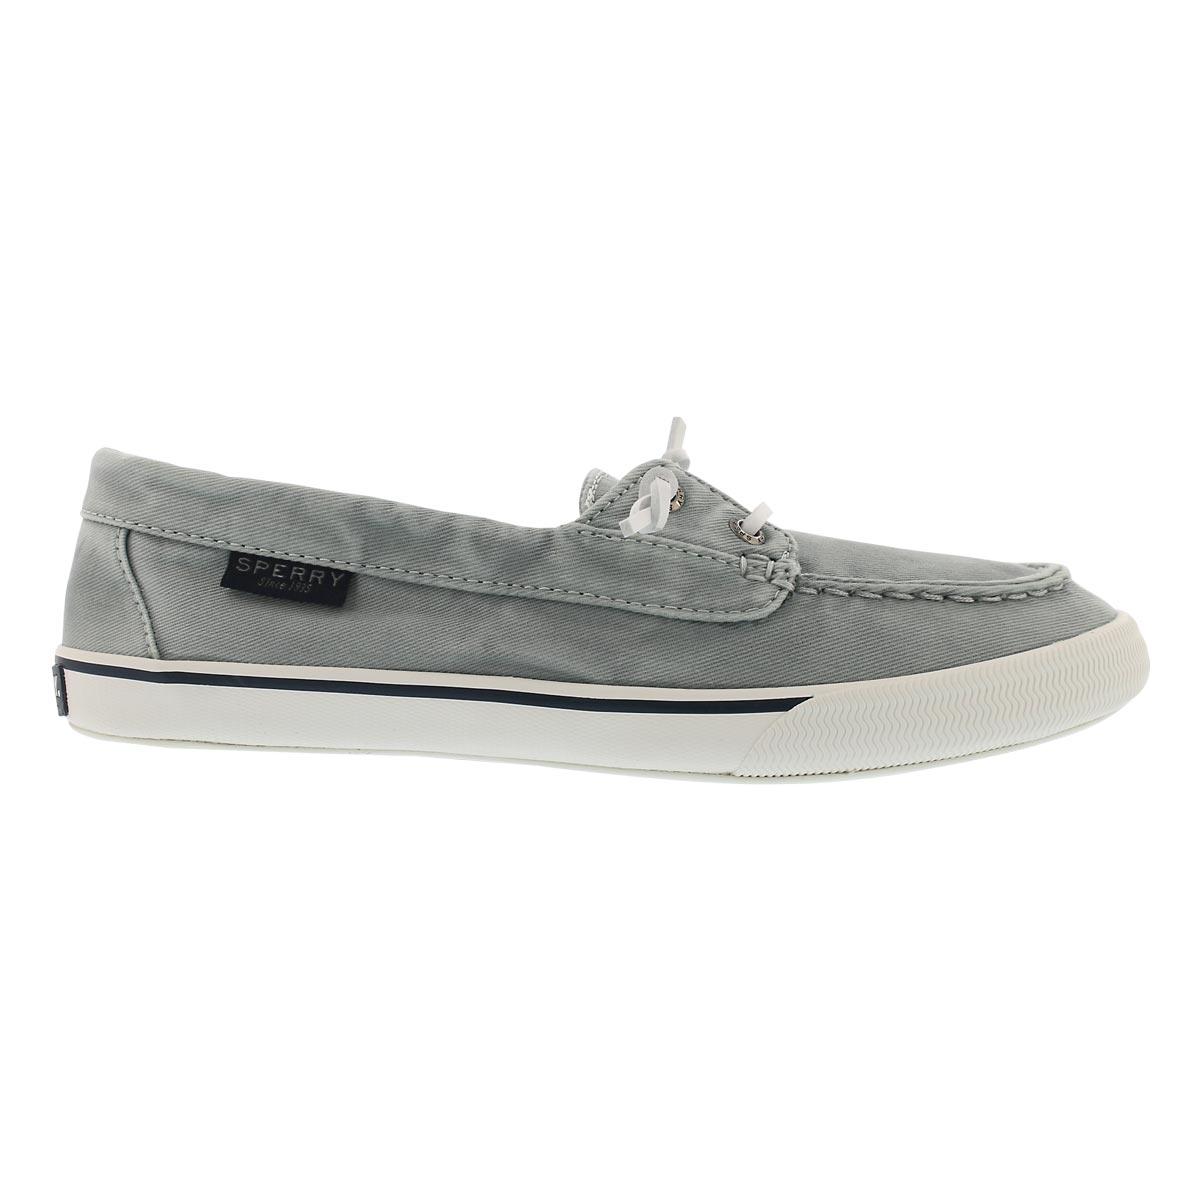 Lds Lounge Away Washed lt blu boat shoe